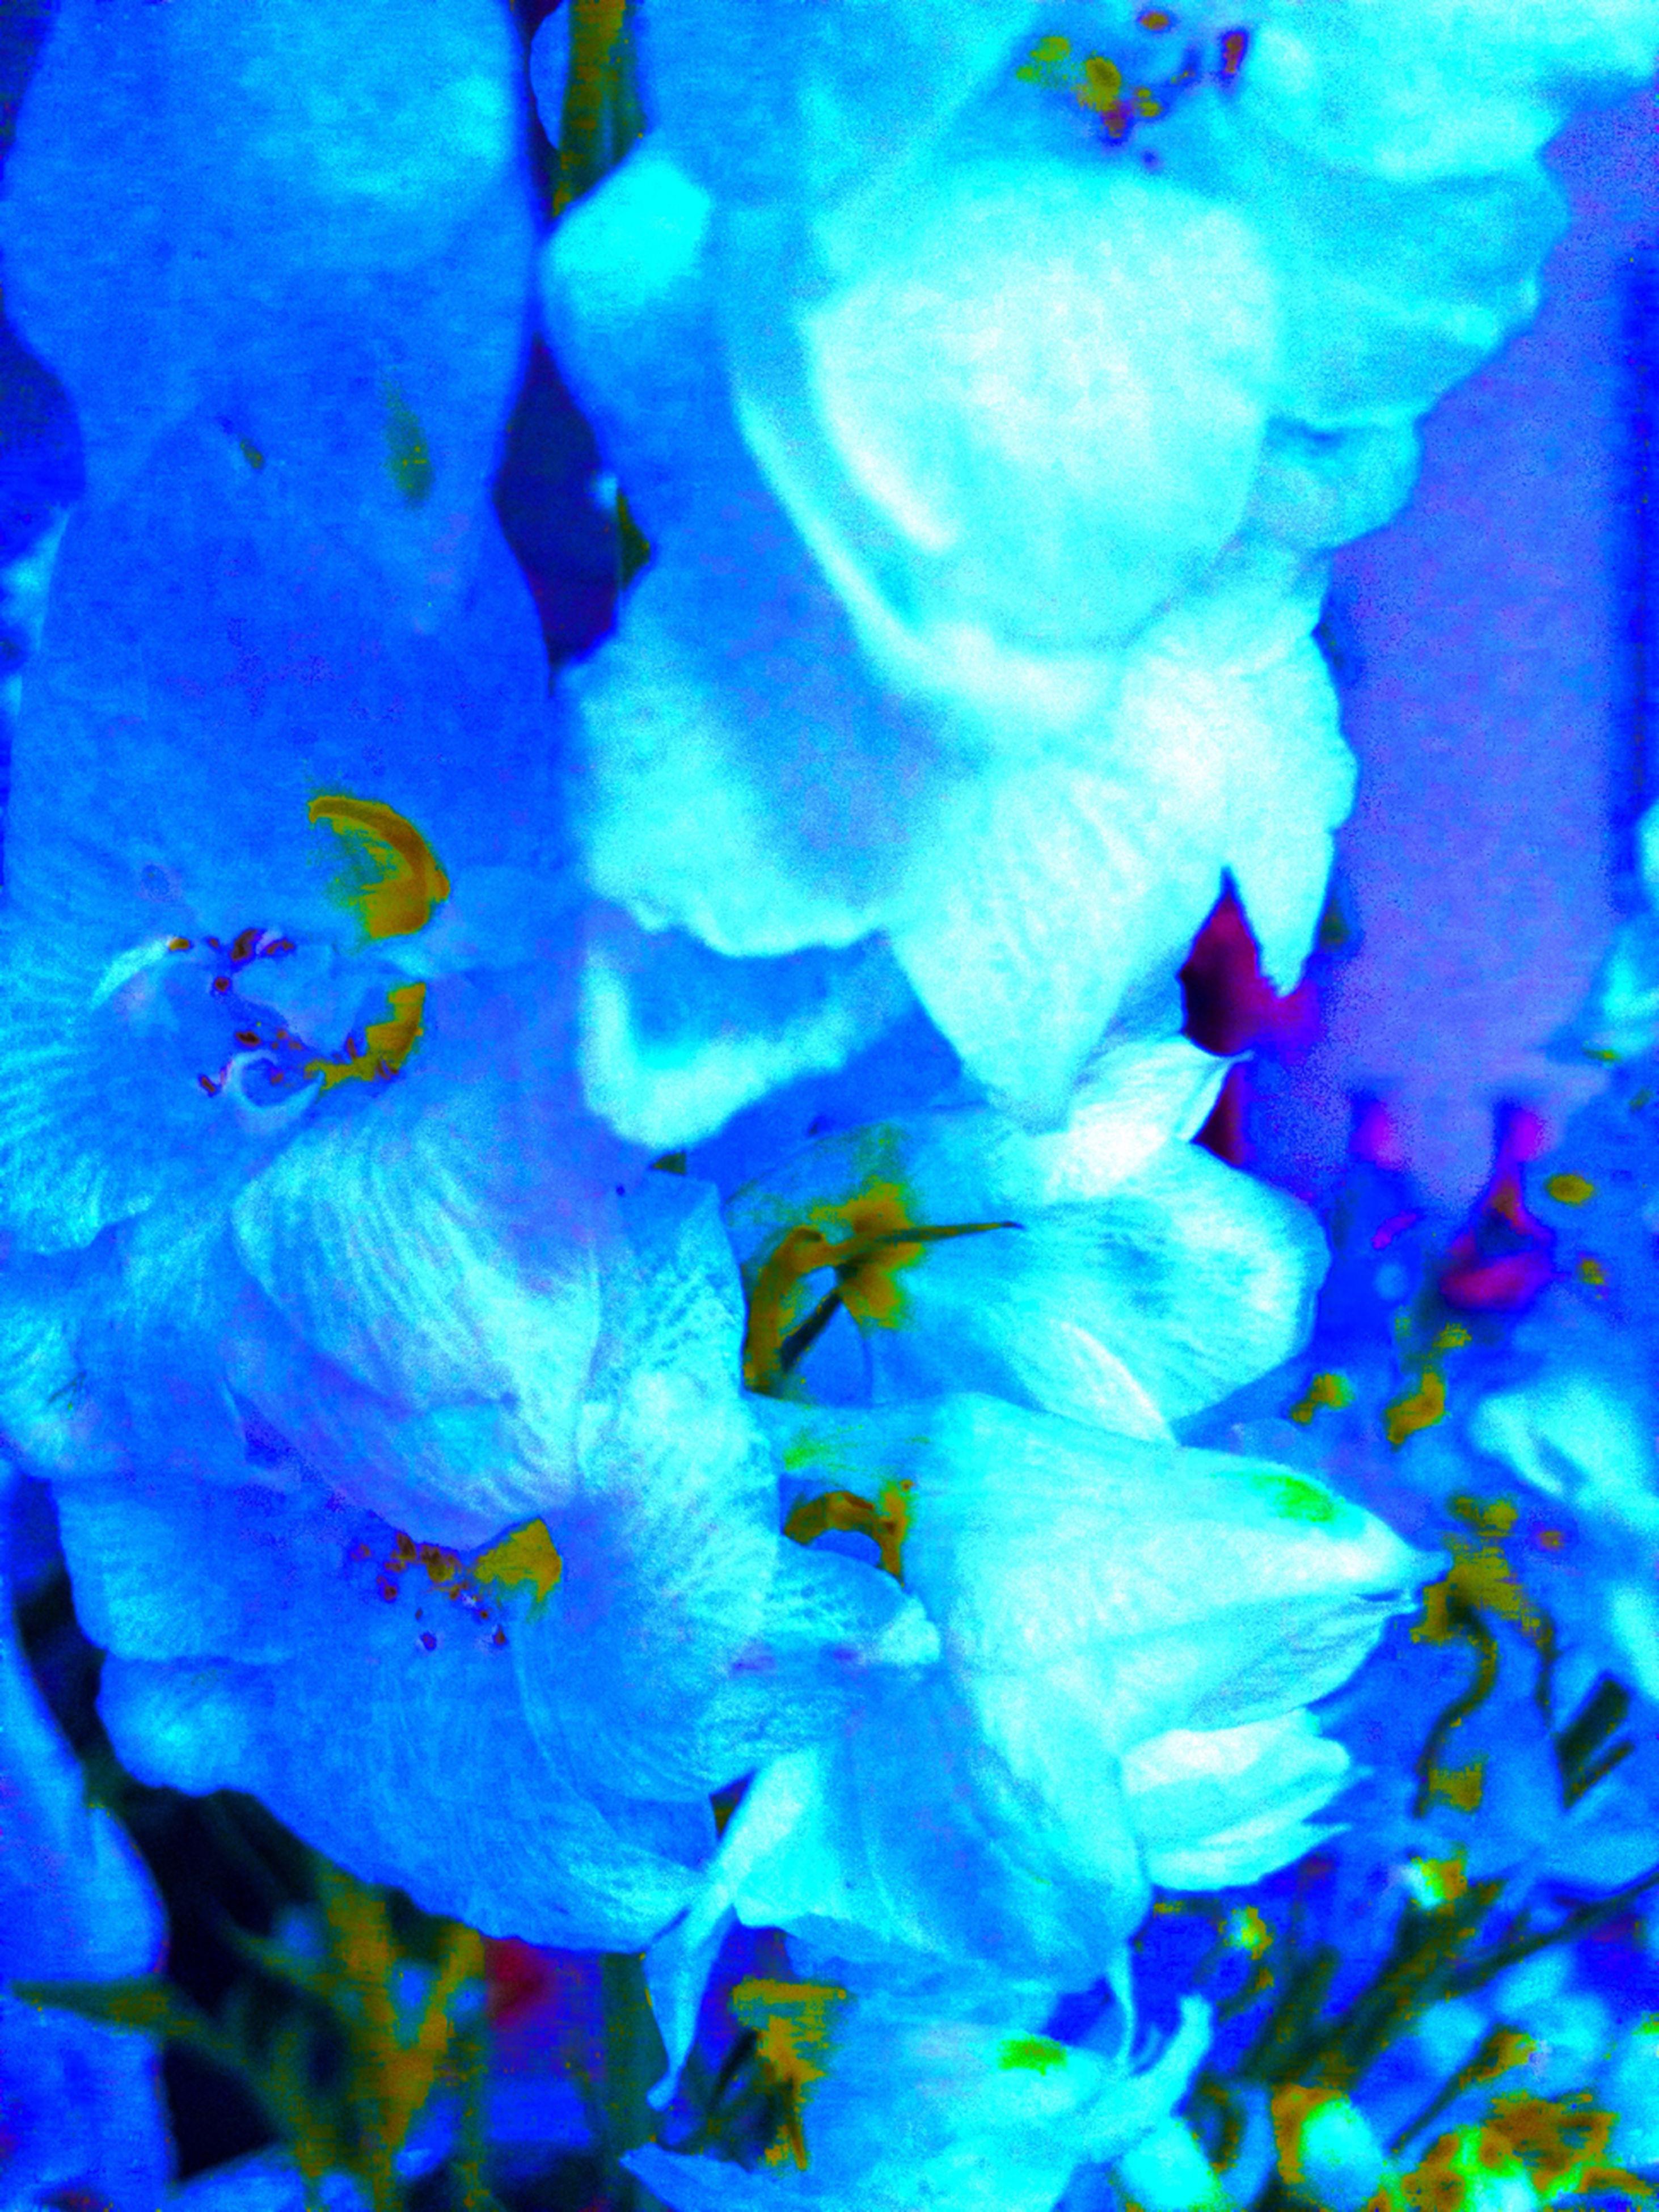 underwater, blue, undersea, sea life, animal themes, swimming, animals in the wild, water, fish, wildlife, indoors, full frame, close-up, aquarium, school of fish, nature, backgrounds, jellyfish, sea